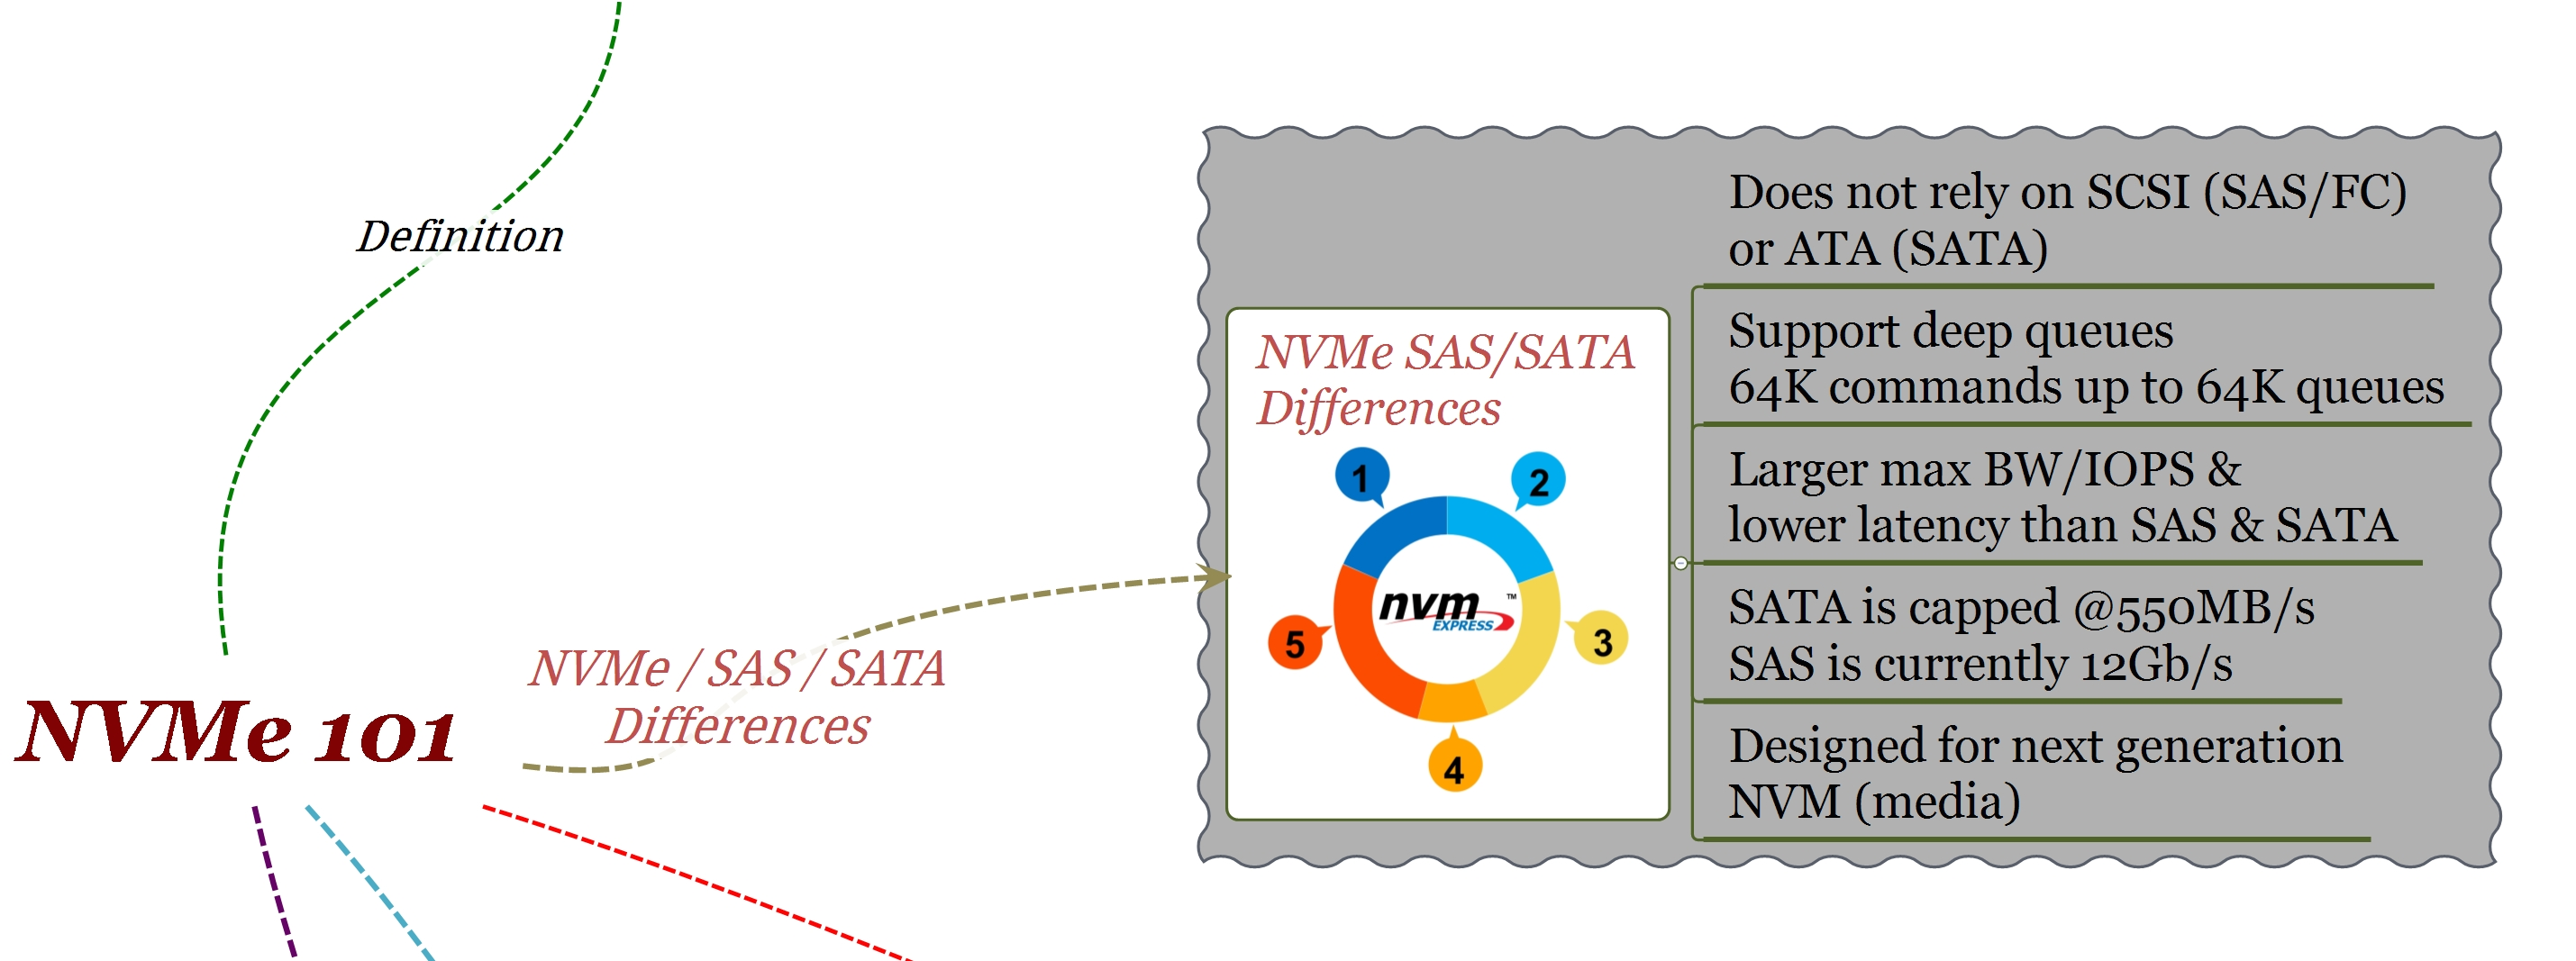 NVMe 101: NVMe / SAS / SATA differences